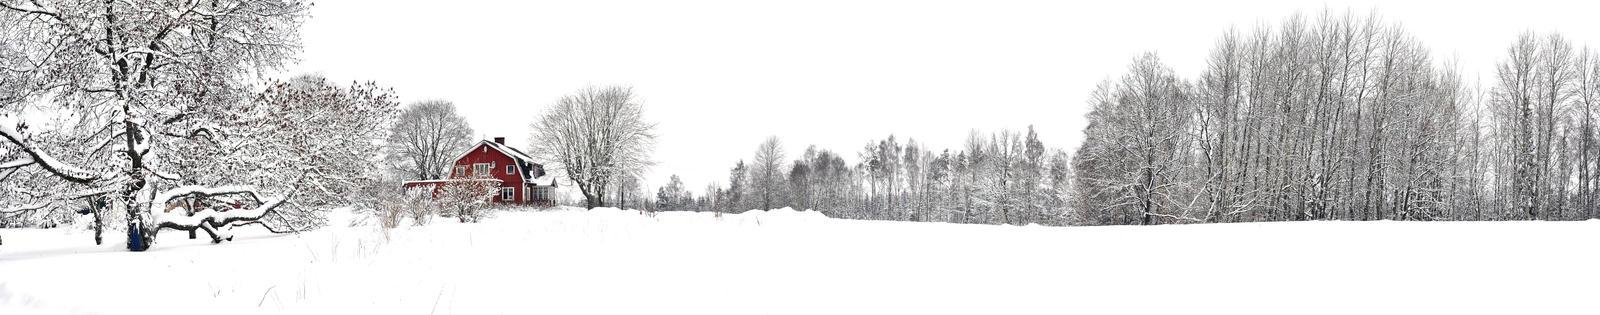 White winter by Levito